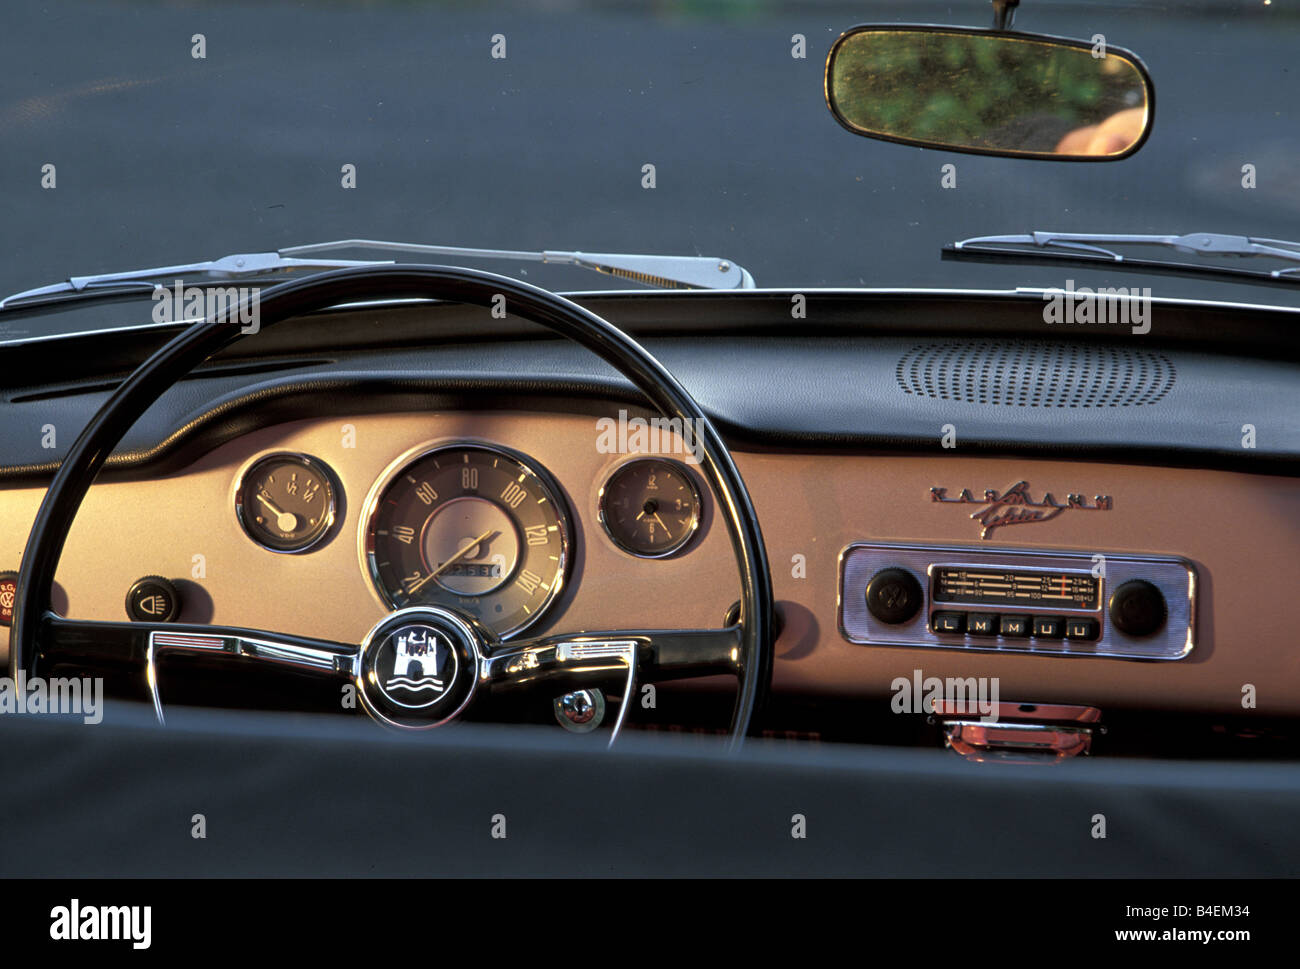 auto vw volkswagen karmann ghia cabrio modell jahr. Black Bedroom Furniture Sets. Home Design Ideas